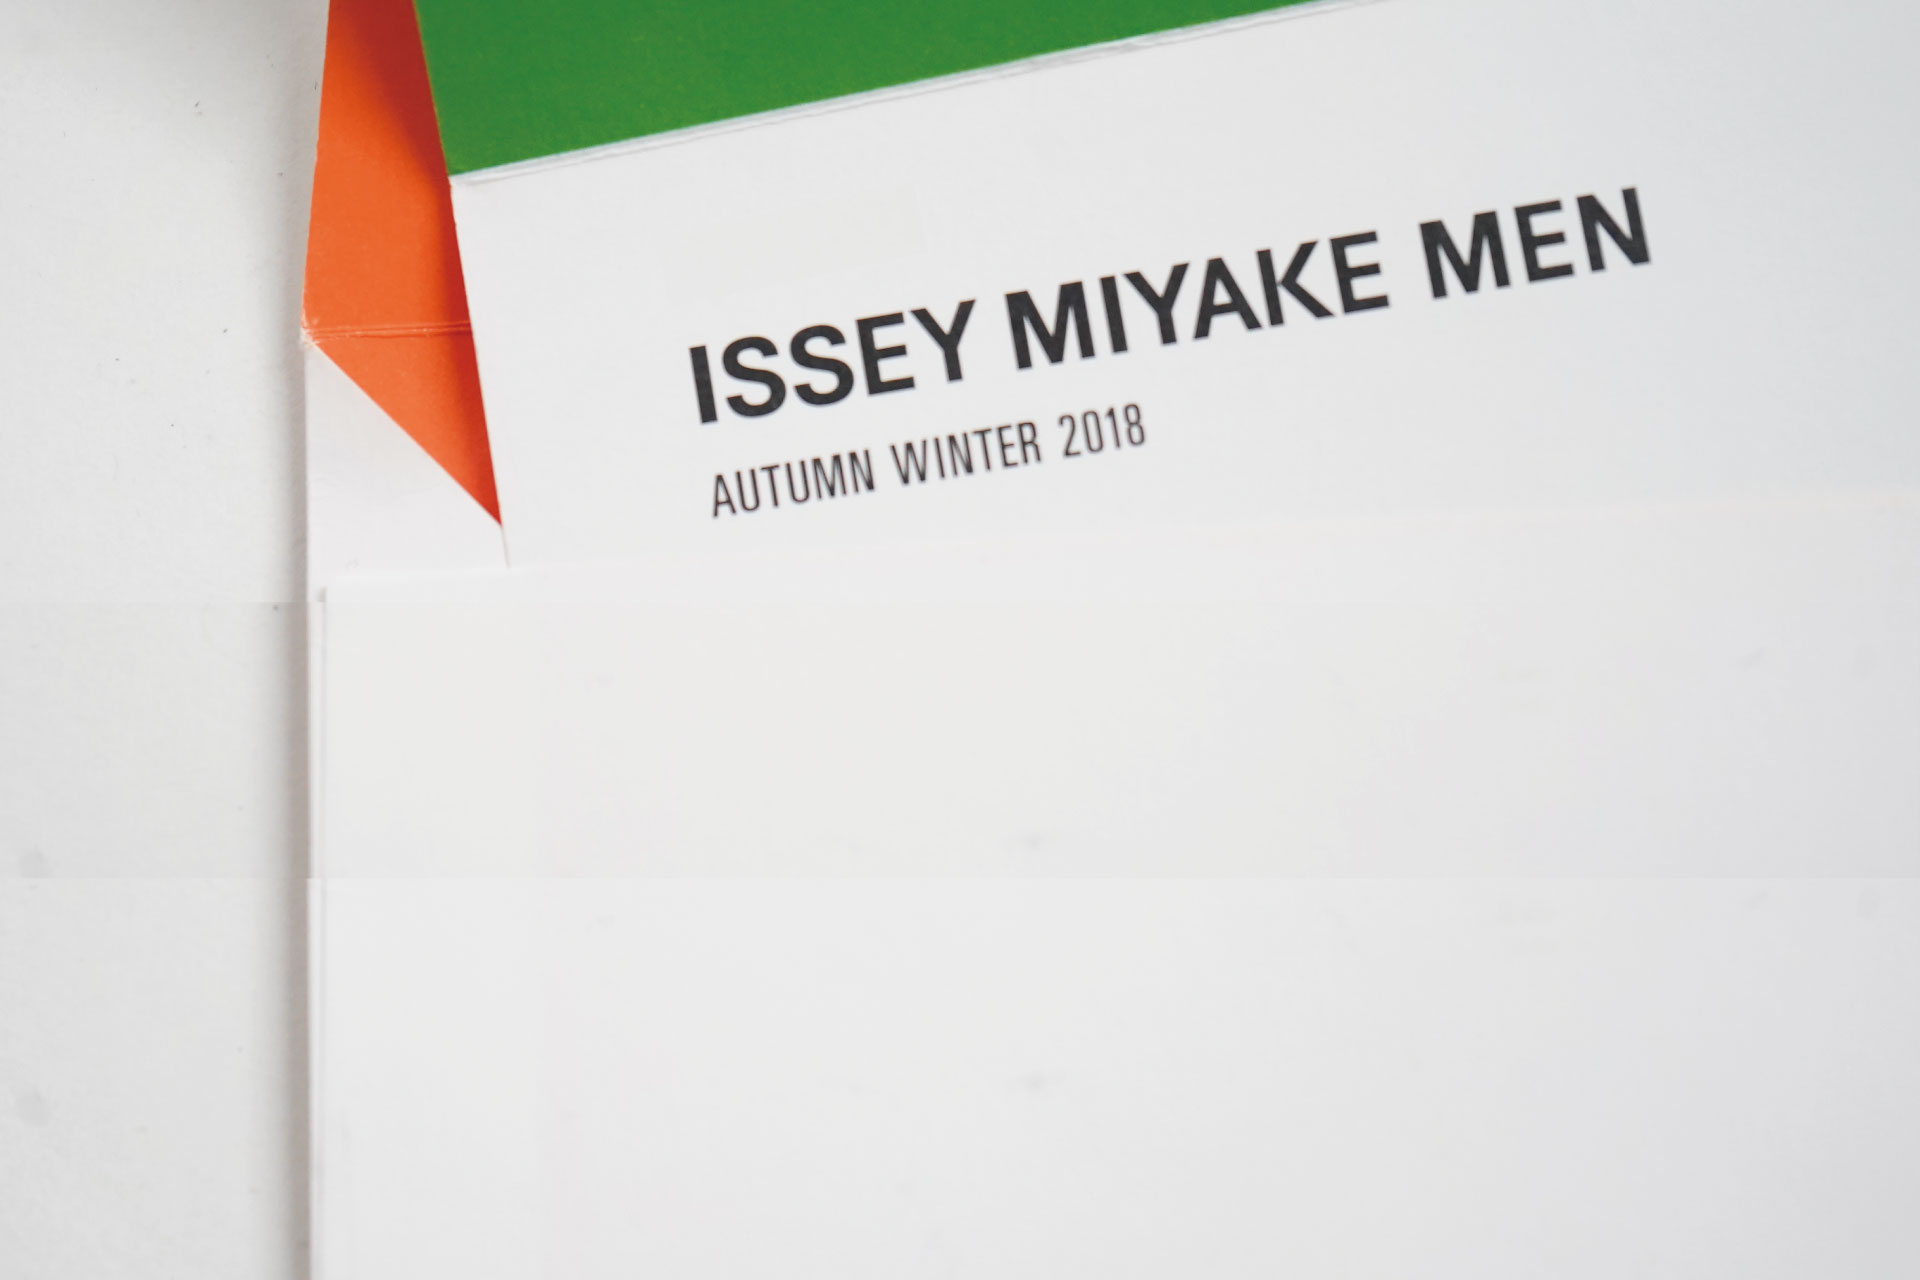 ISSEY MIYAKE MEN NOW ON SALE